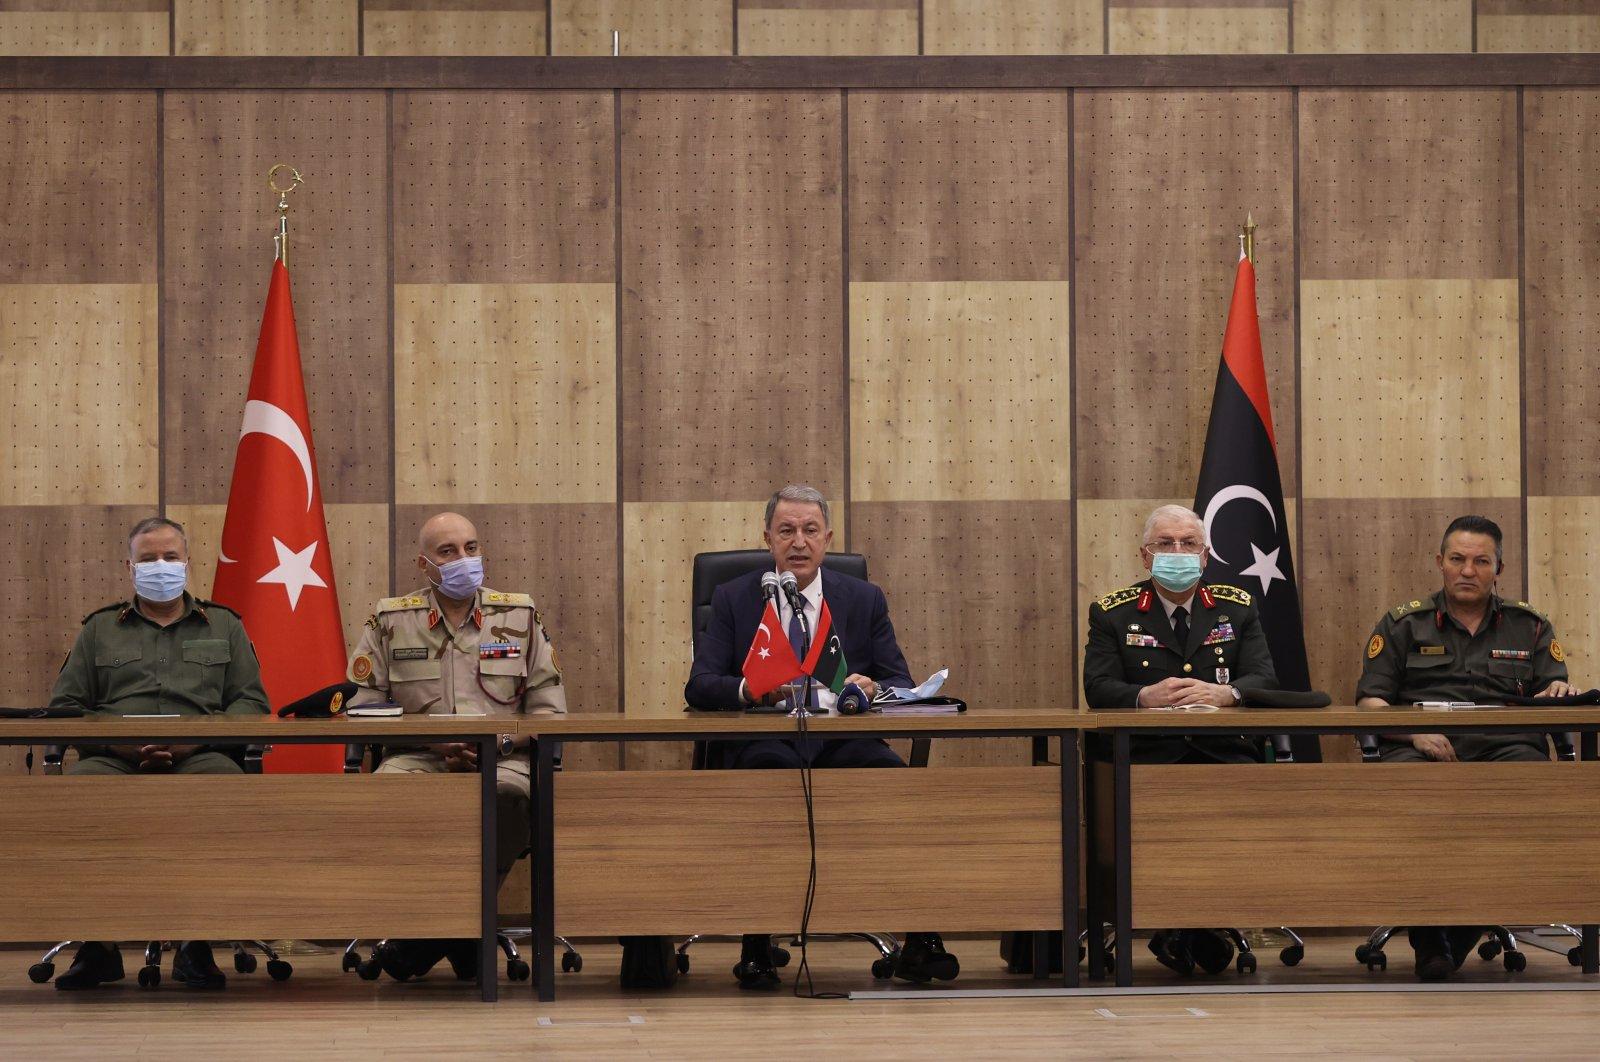 Turkey's Defense Minister Hulusi Akar (C) addresses Turkish military personnel in Tripoli, Libya, May 4, 2021. (AA Photo)